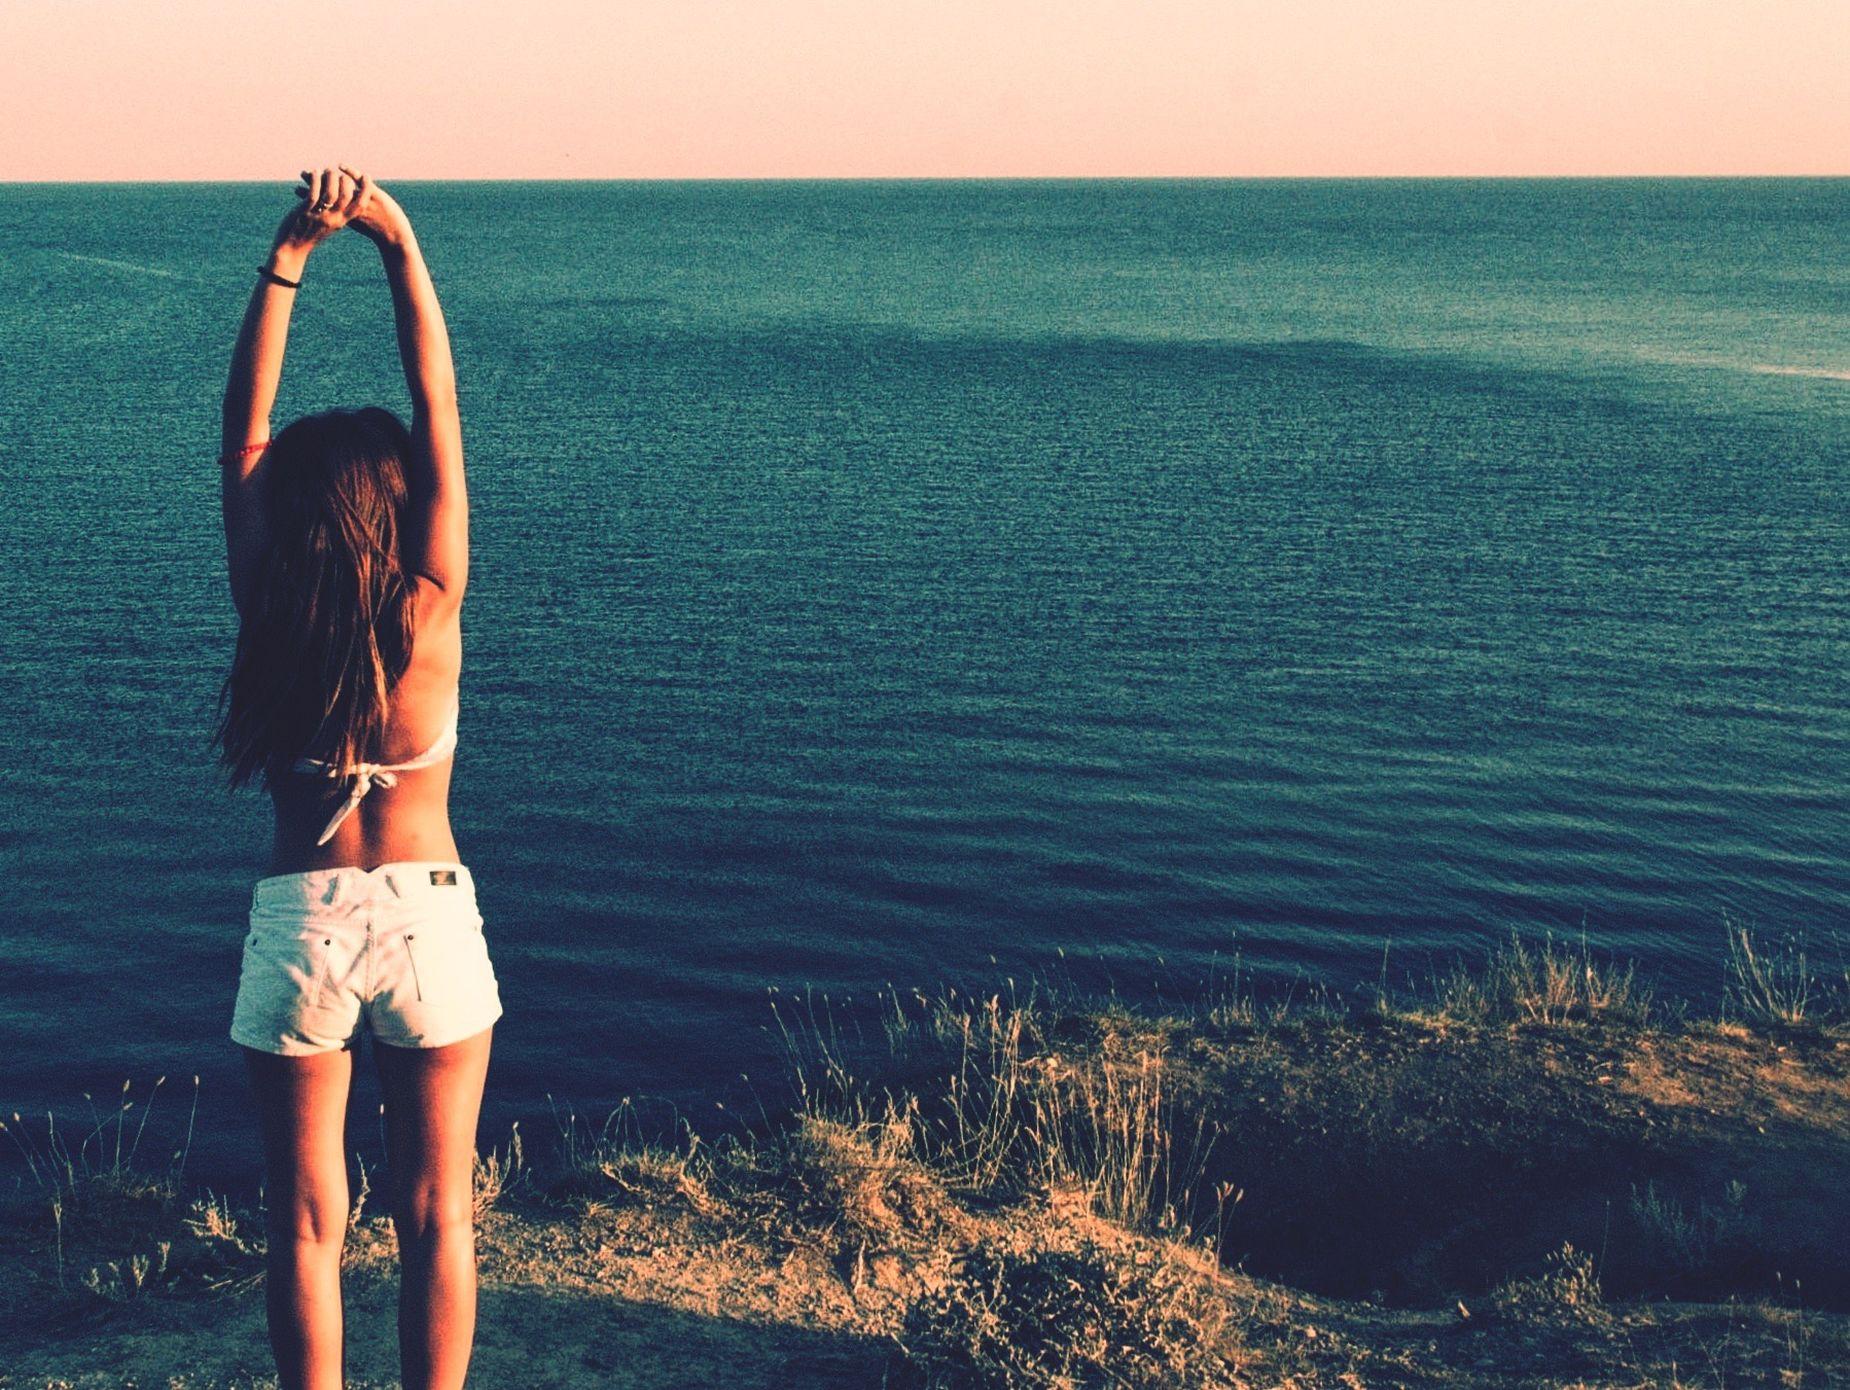 Crazy holidays 😻🎉💕😢 Summer Summertime Crazy Holidays Girl Black Sea Sea Life